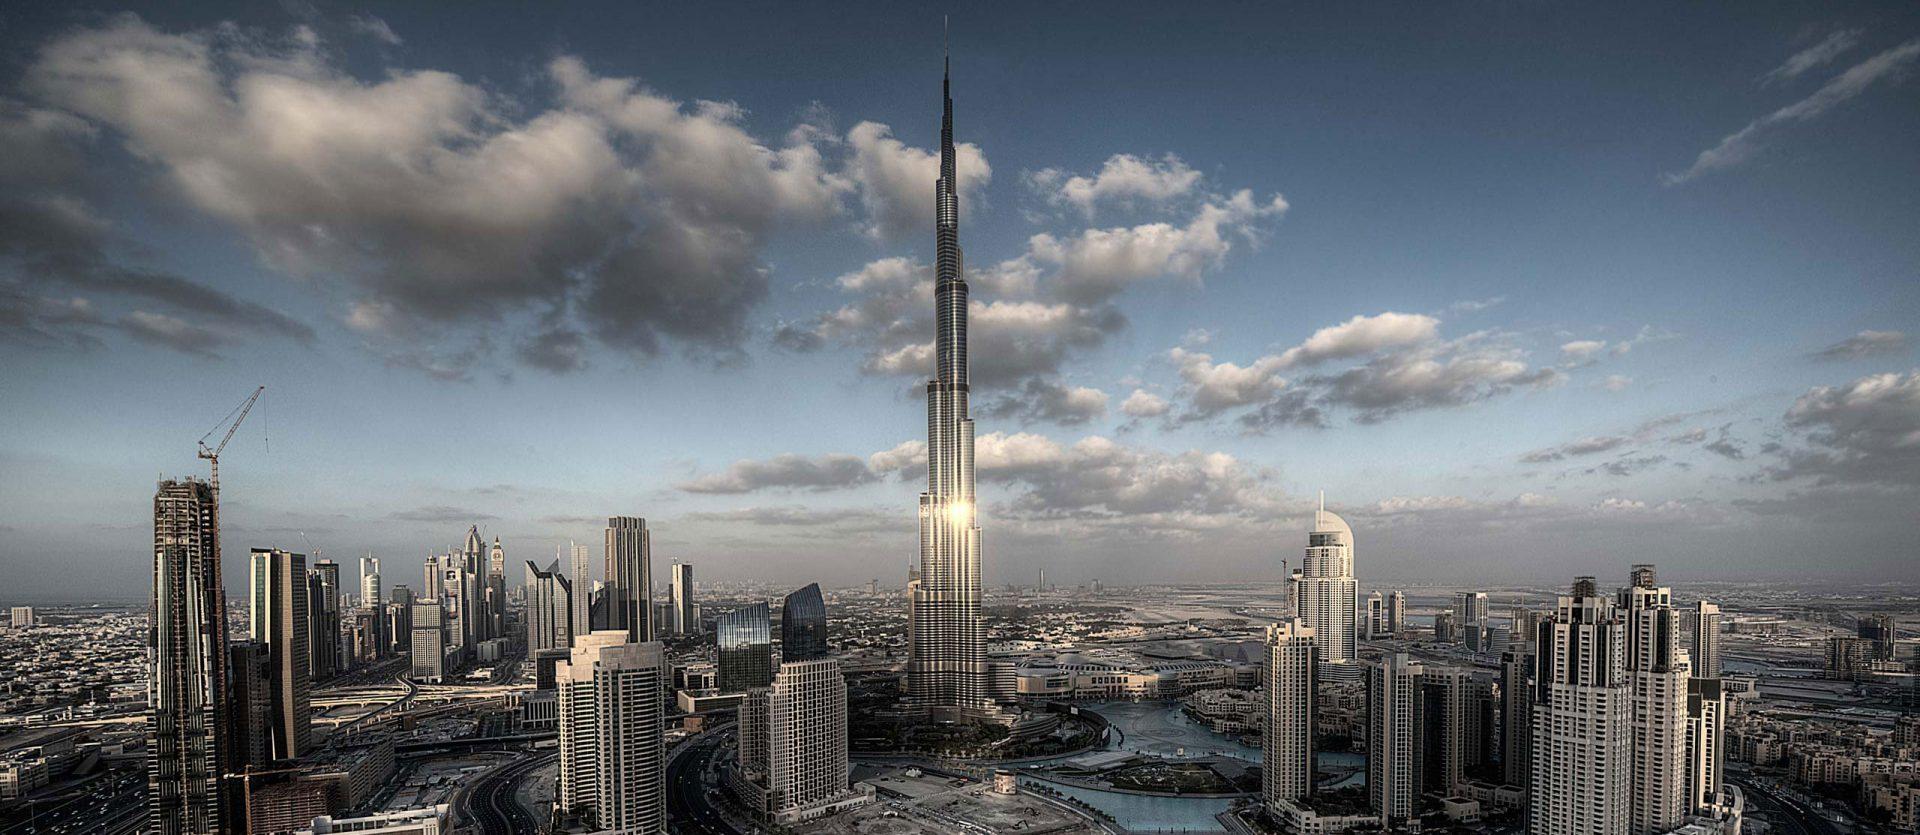 Short Term Vacation Apartment Rentals in Dubai